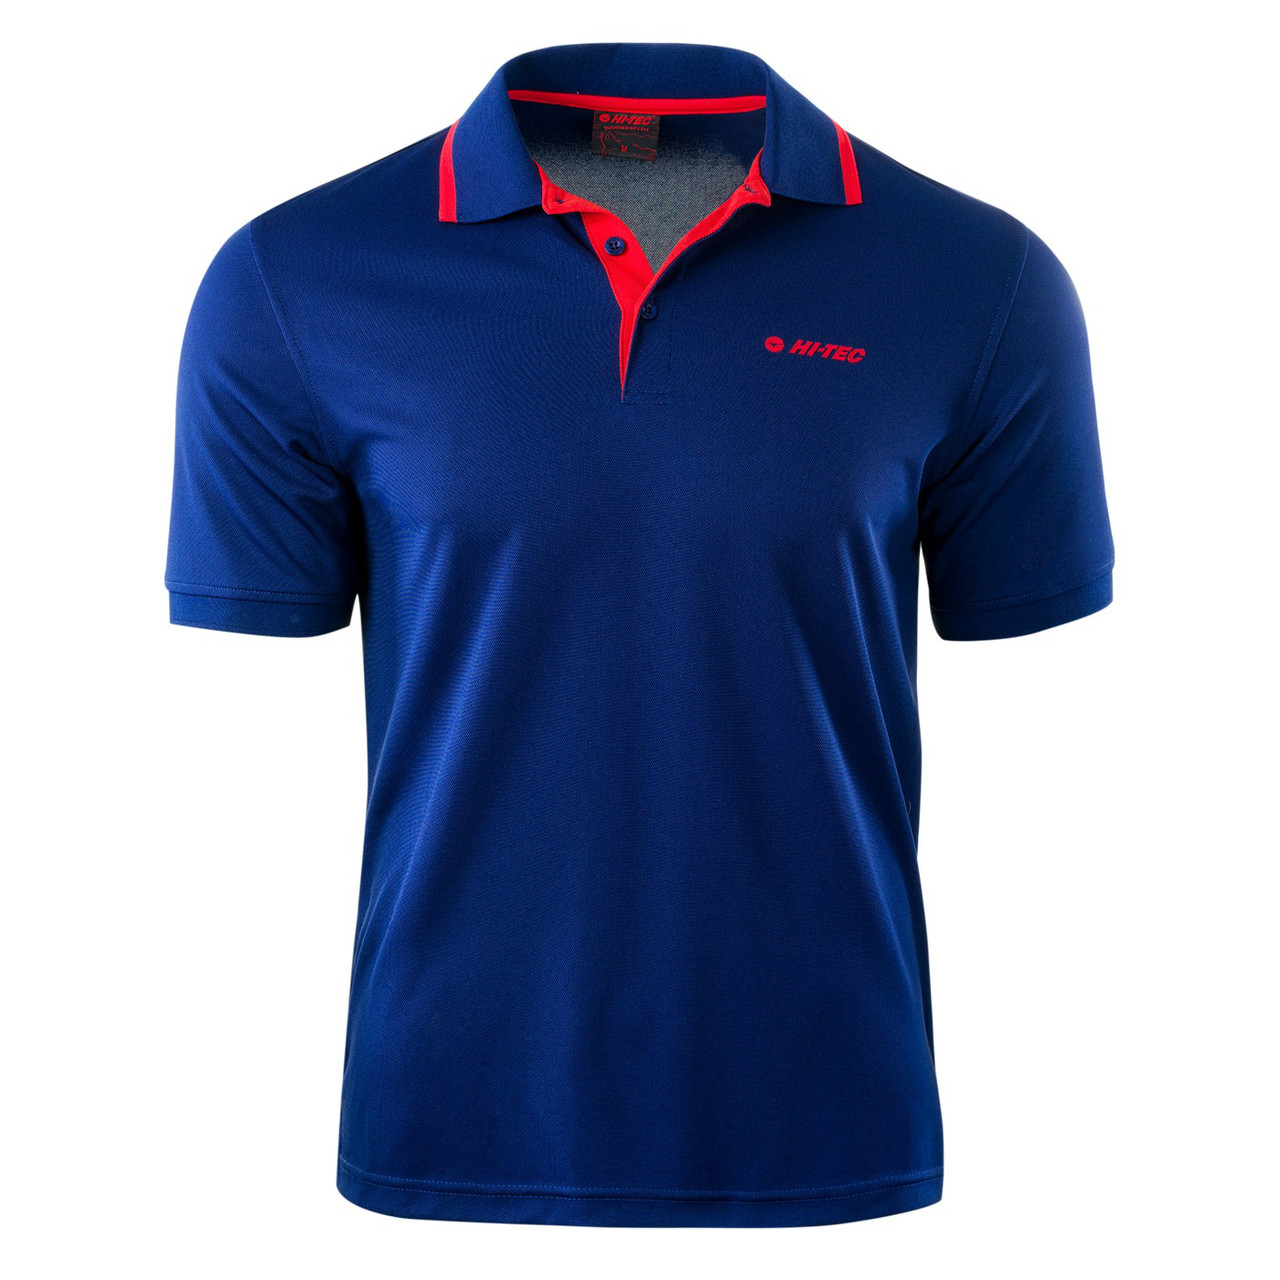 Мужская футболка поло Hi-Tec Site BLUE PRINT